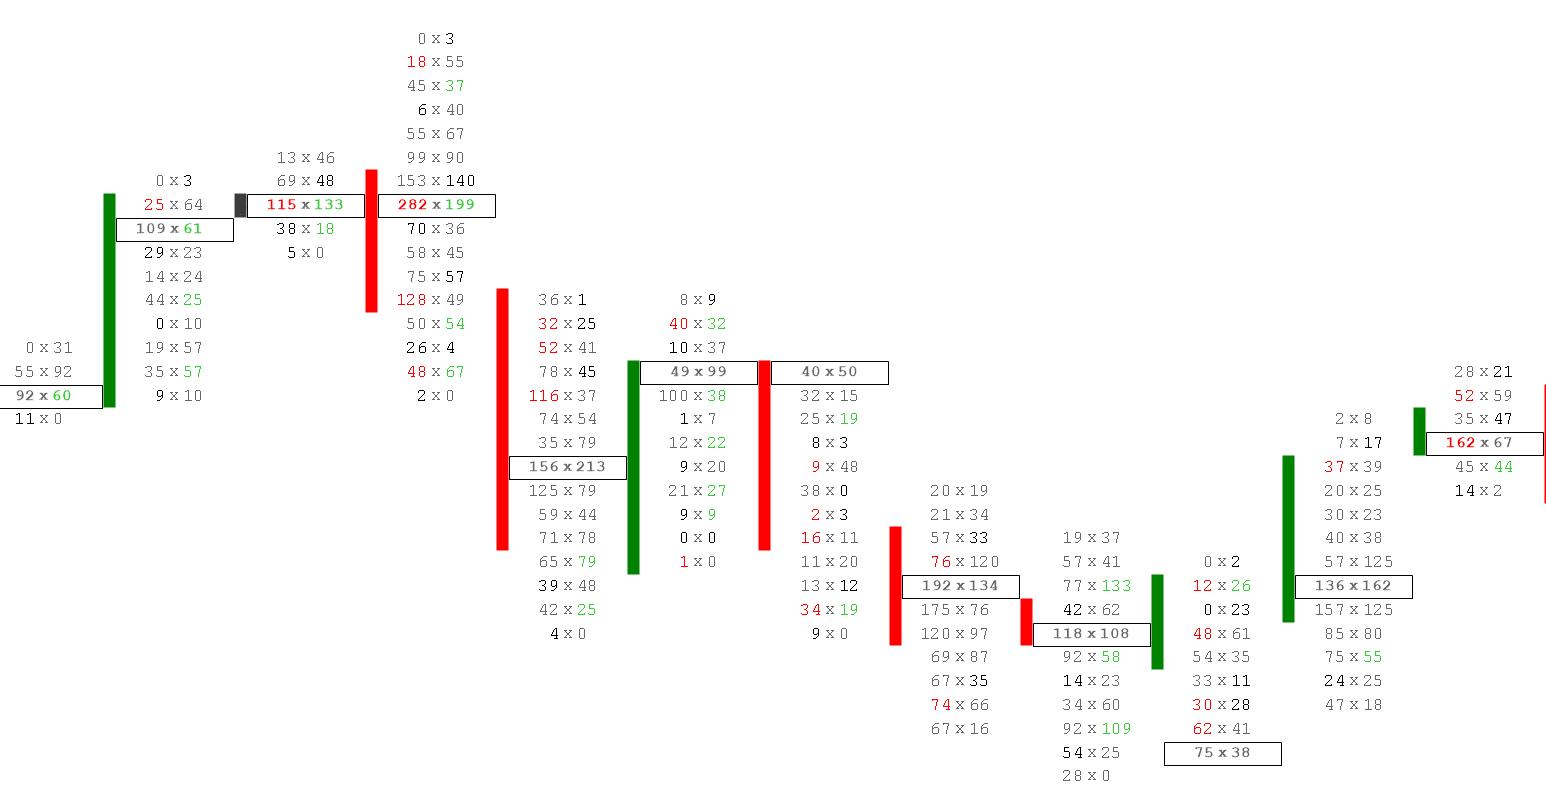 footprint trading chart